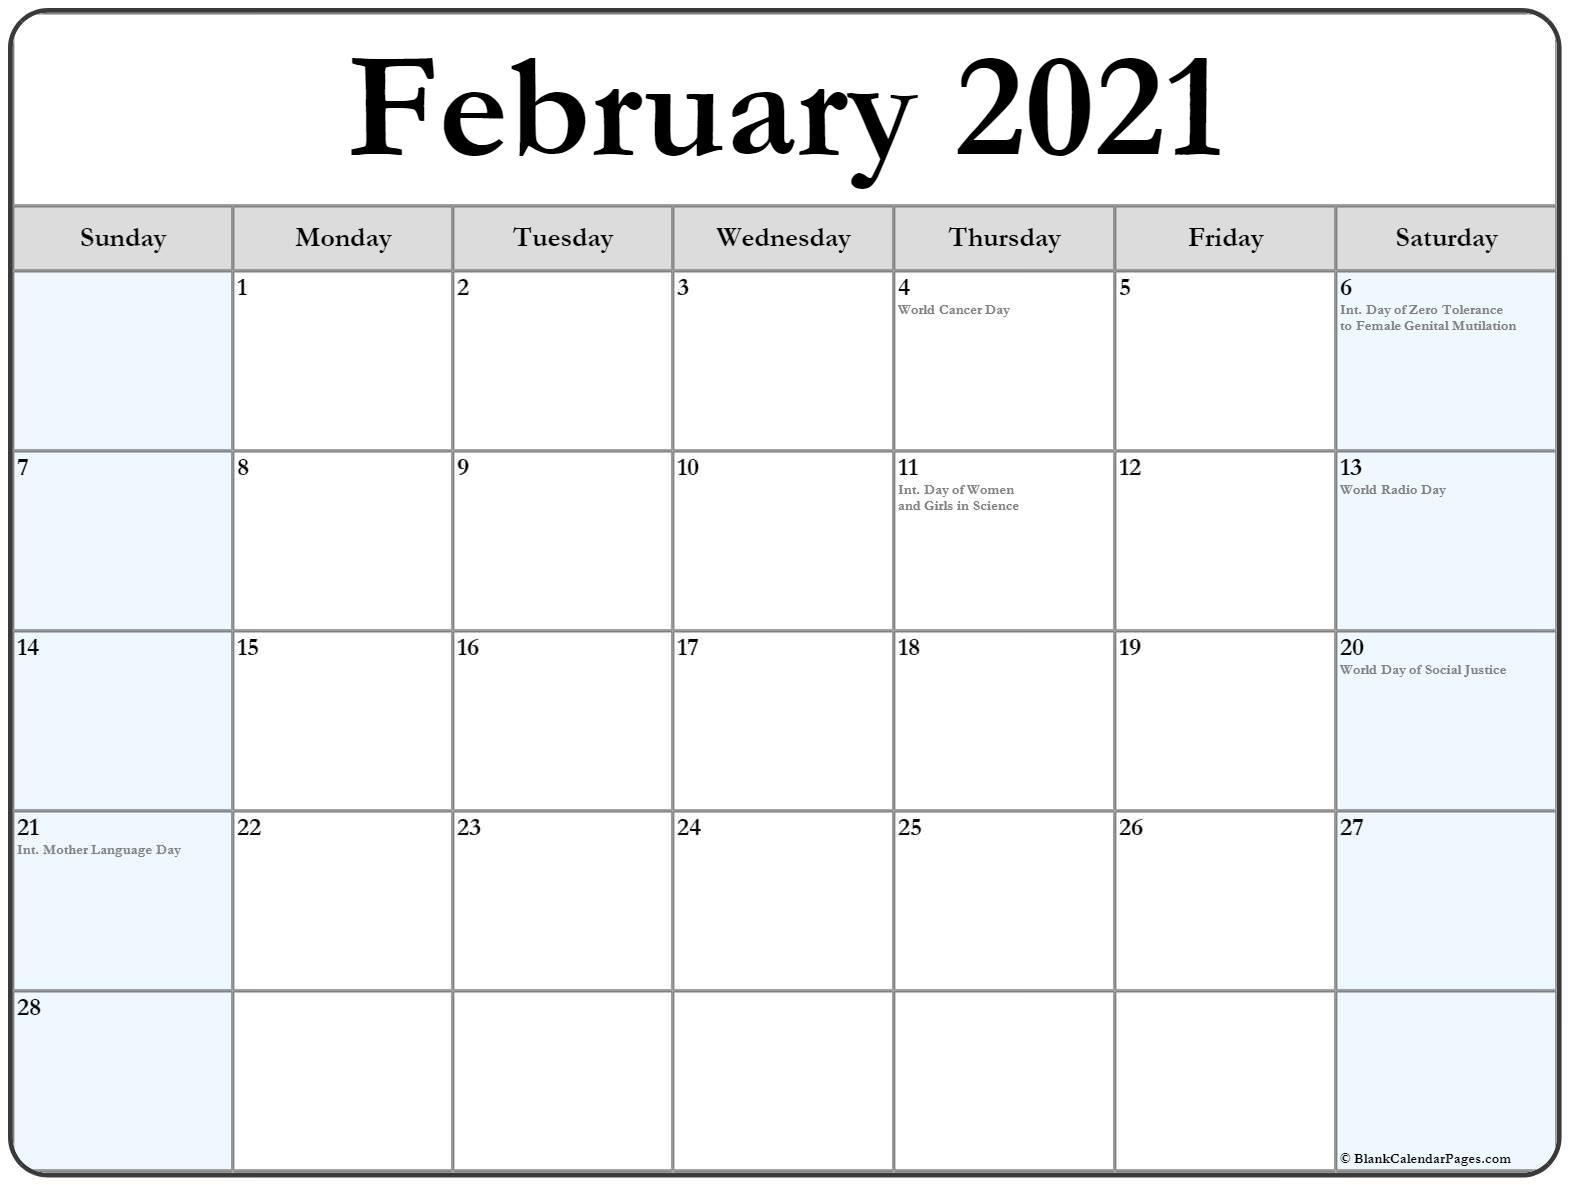 February 2021 Calendar With Holidays National Calendar October 2021